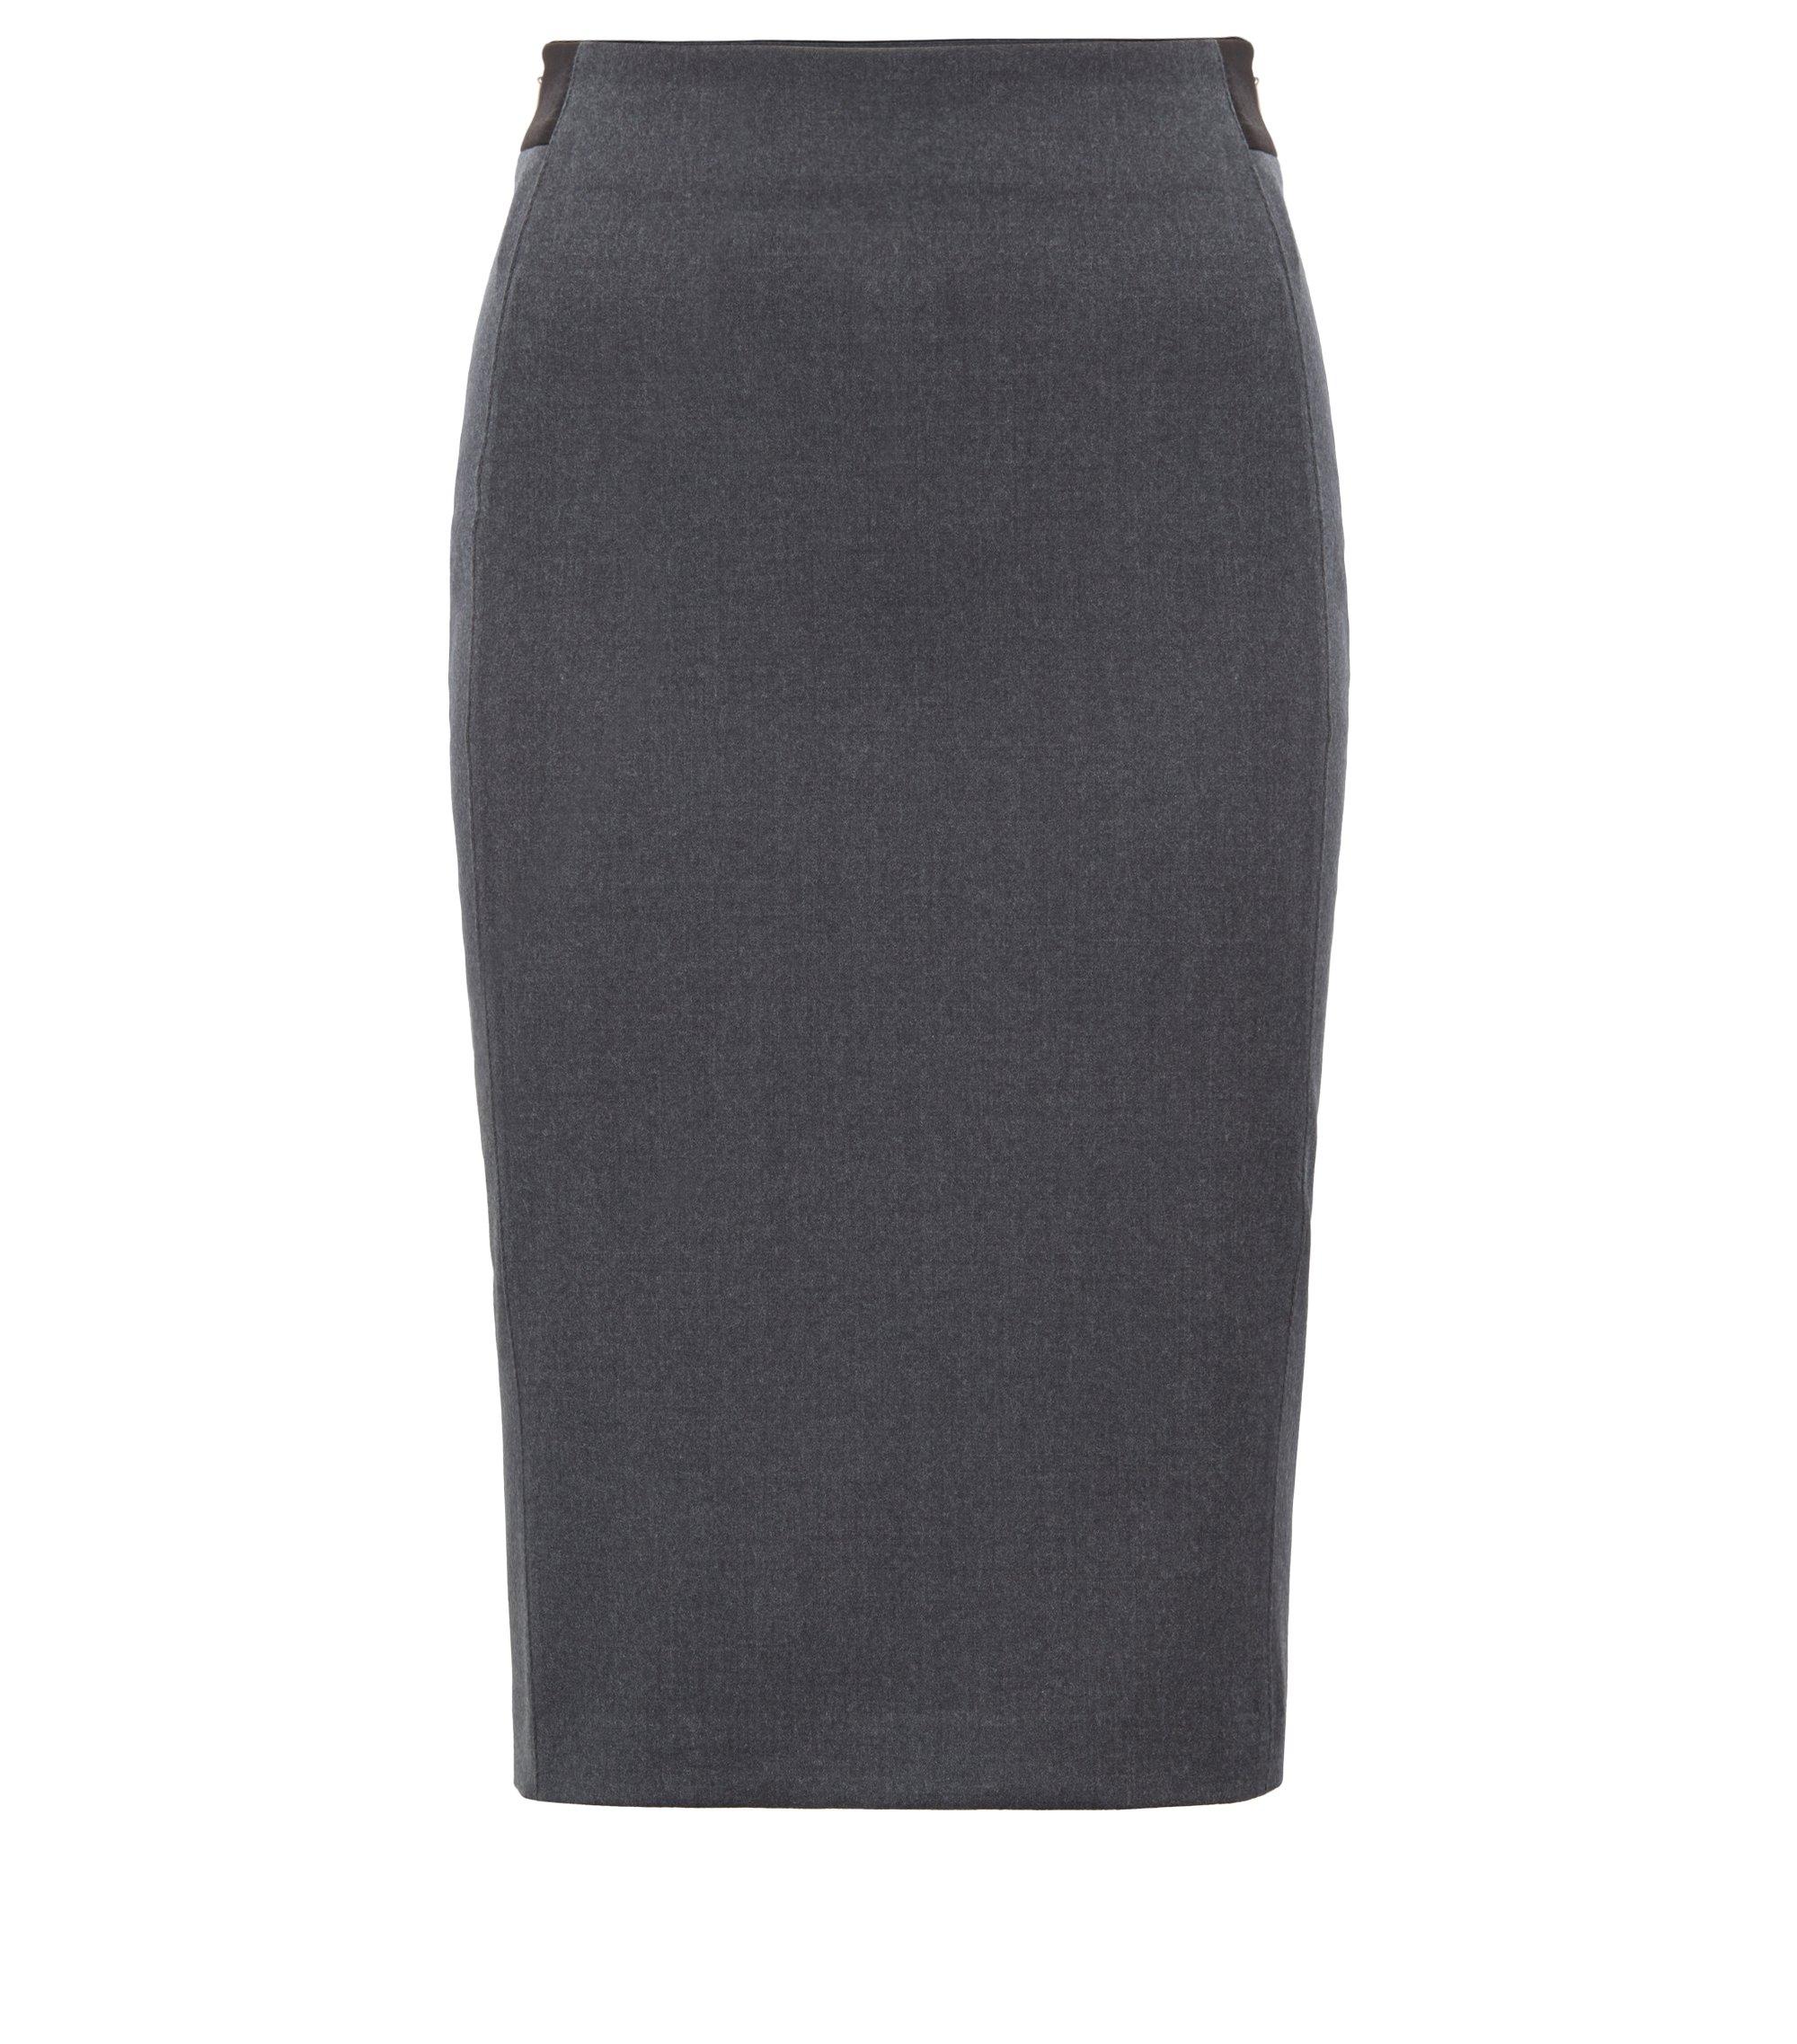 Regular-fit pencil skirt in stretch virgin wool melange, Charcoal